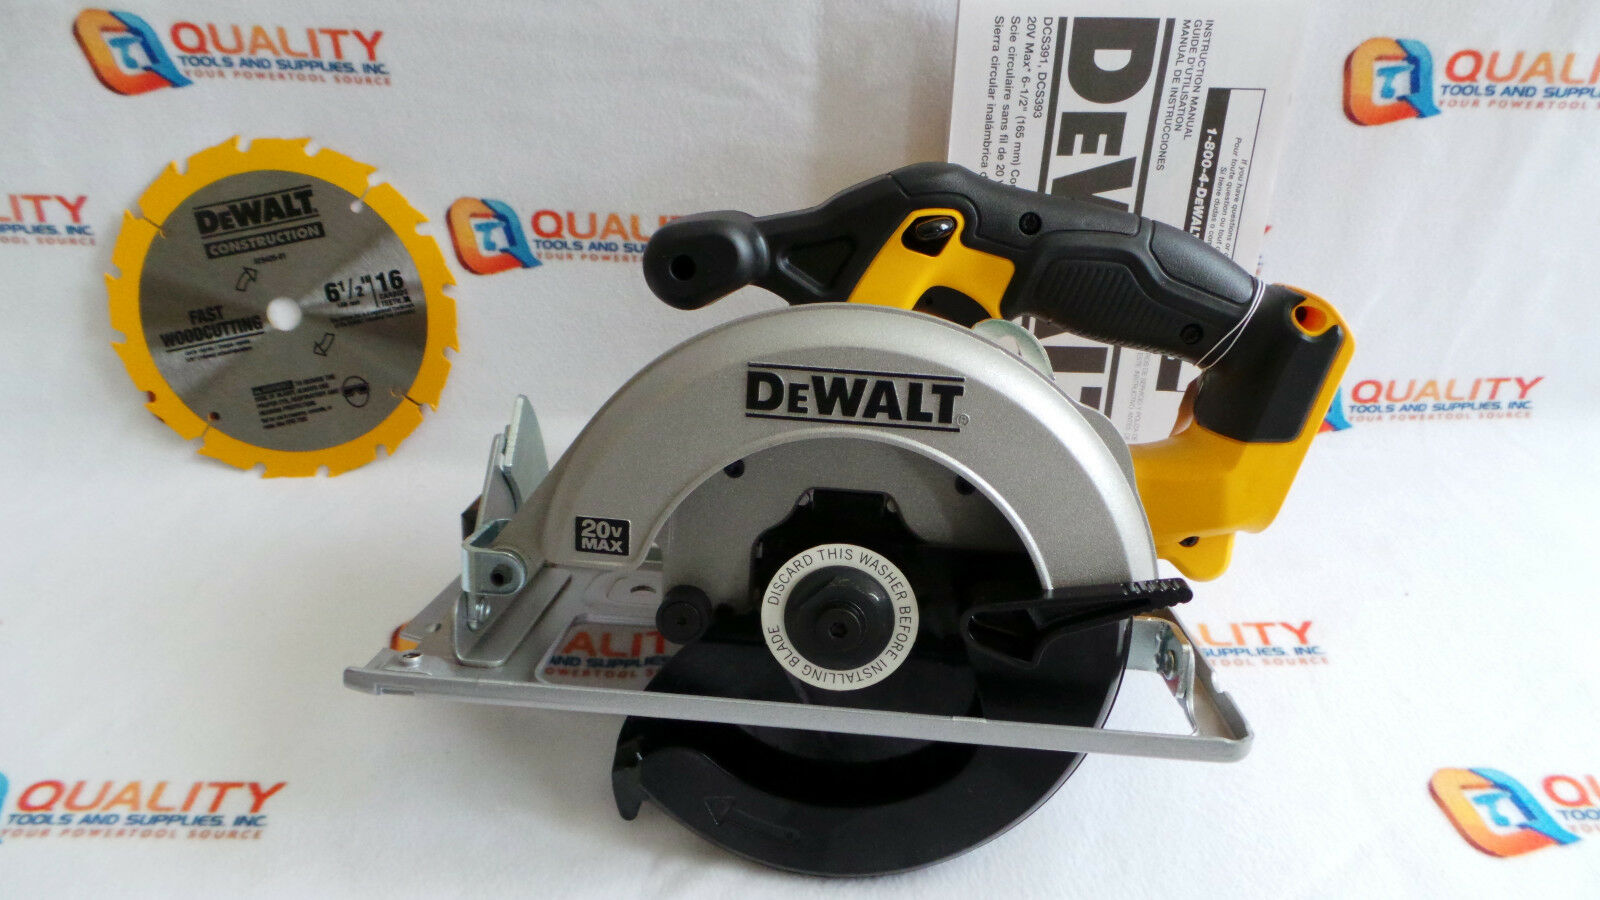 New Dewalt DCS393 20V Max Li-Ion 6-1/2